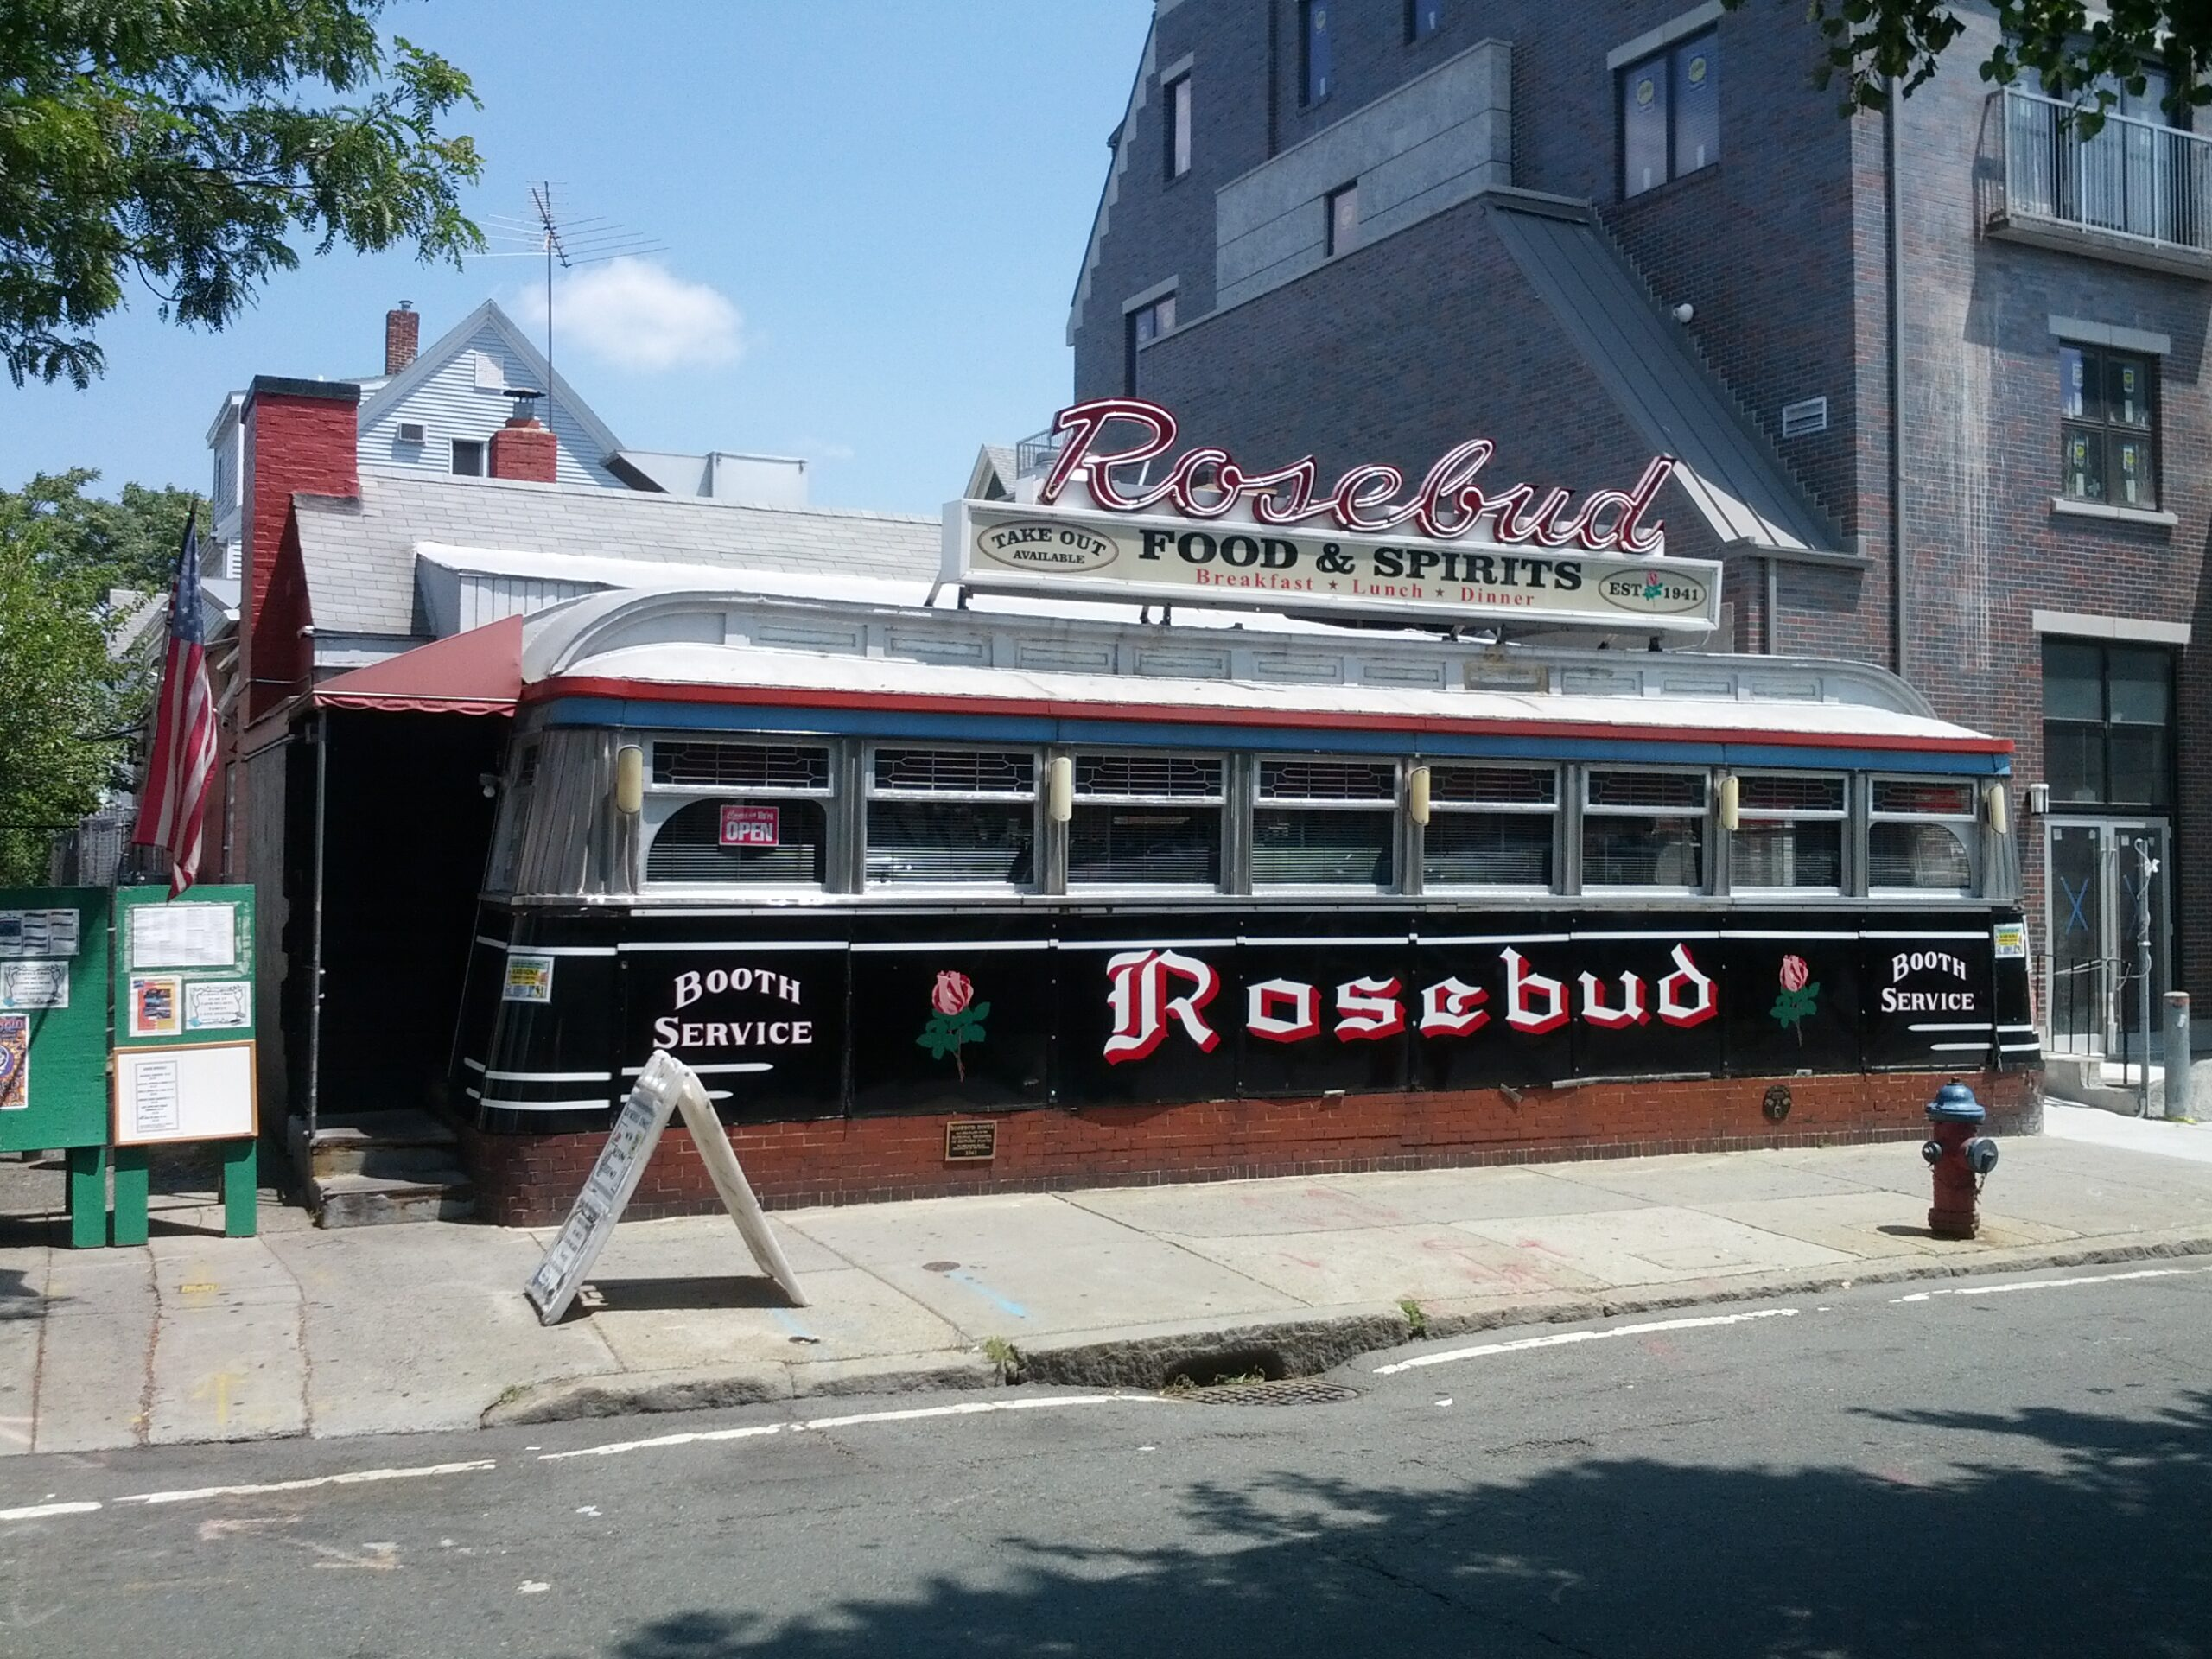 Rosebud Diner